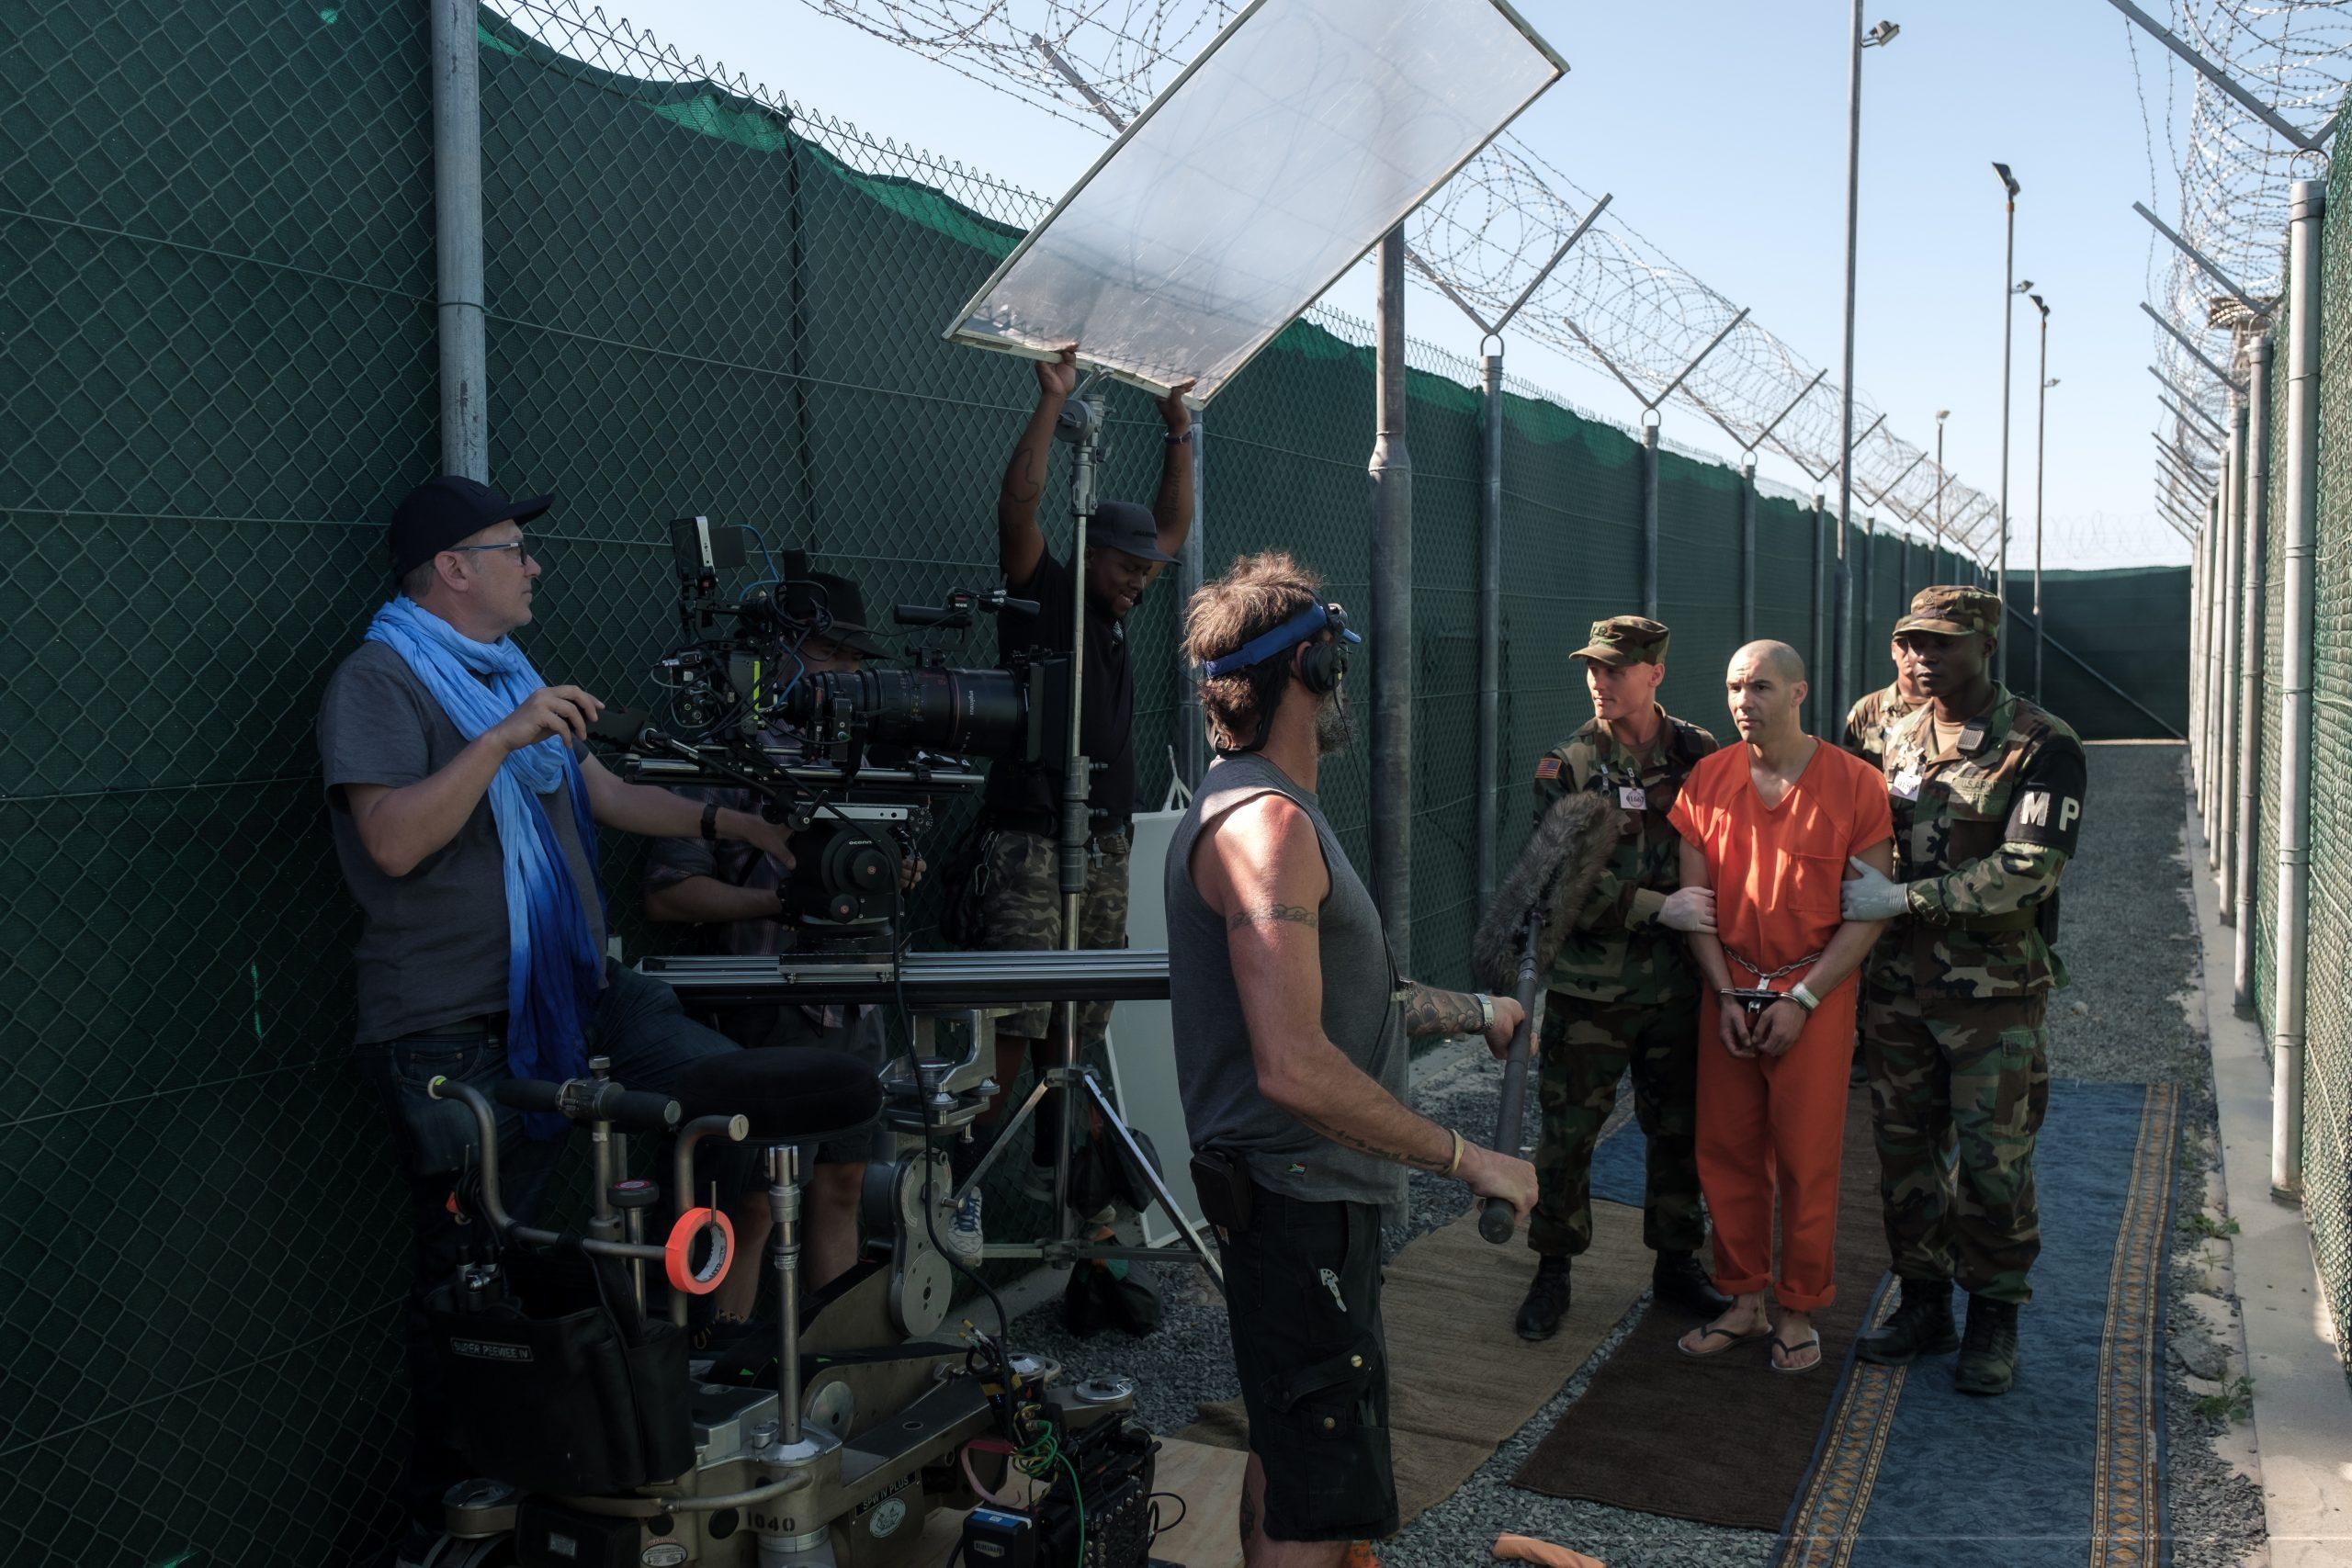 MonoFilm The Mauritanian มอริทาเนียน : พลิกคดี จองจำอำมหิต เควิน แมคโดนัลด์